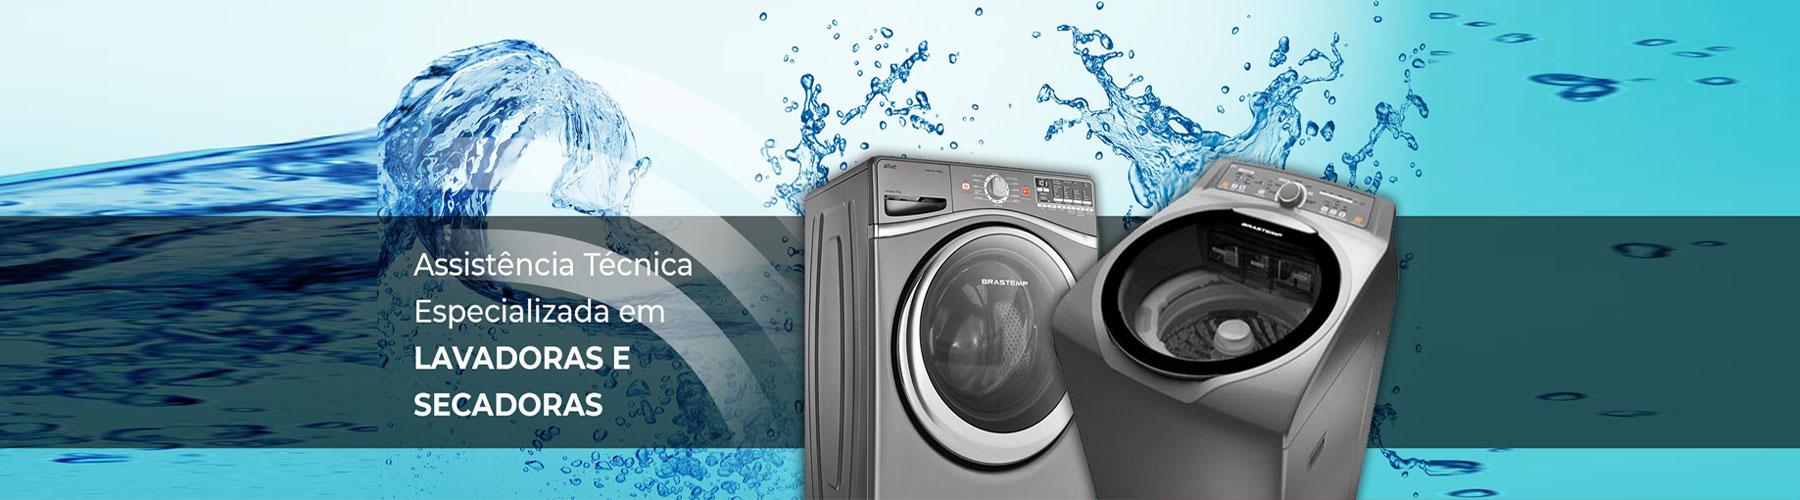 conserto de lavadora de roupas balneario camboriu maquinas de lavar